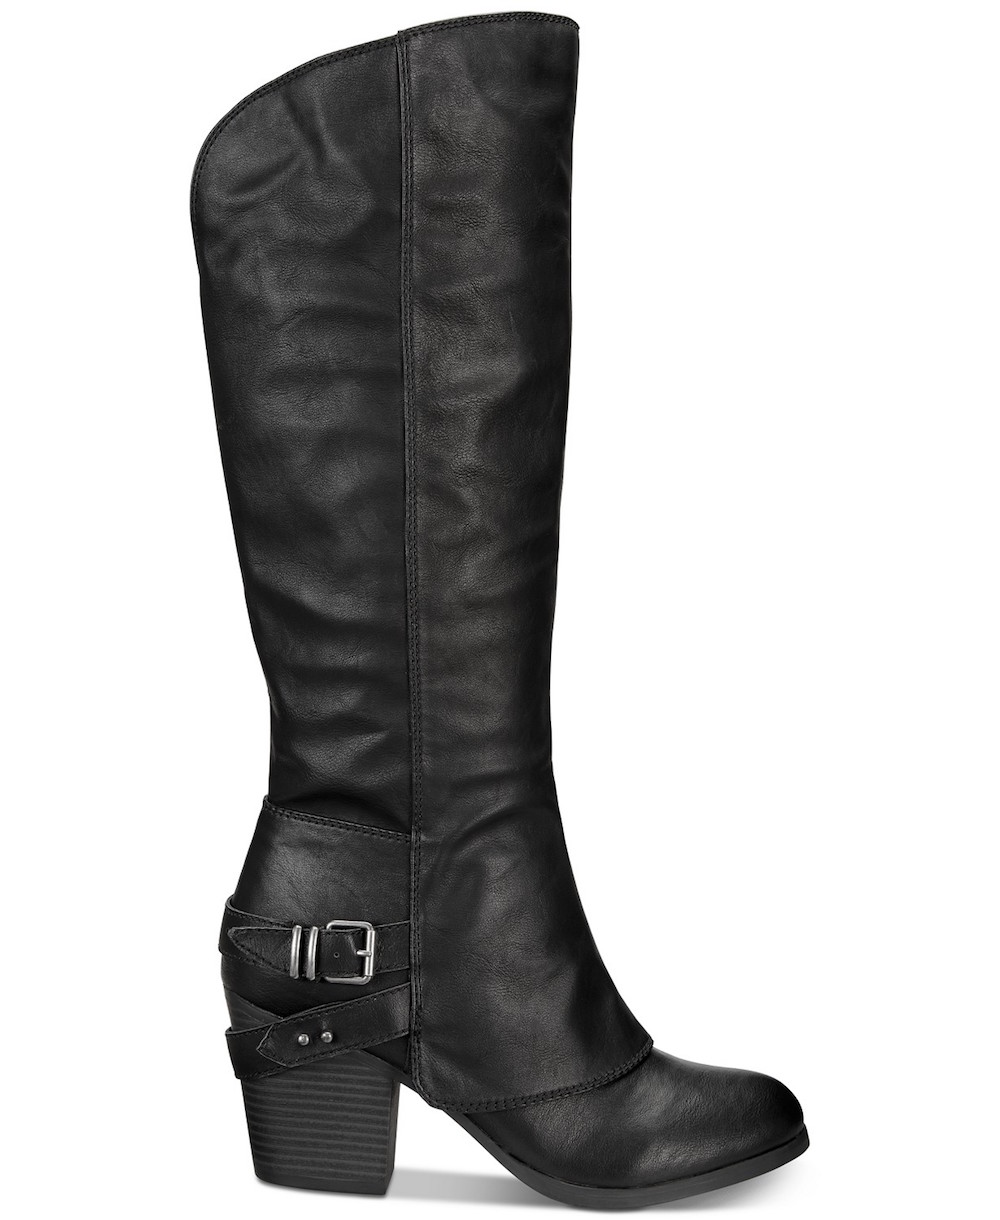 American Rag Womens Emilee Almond Toe Knee High Fashion Boots Size 9.0 Black